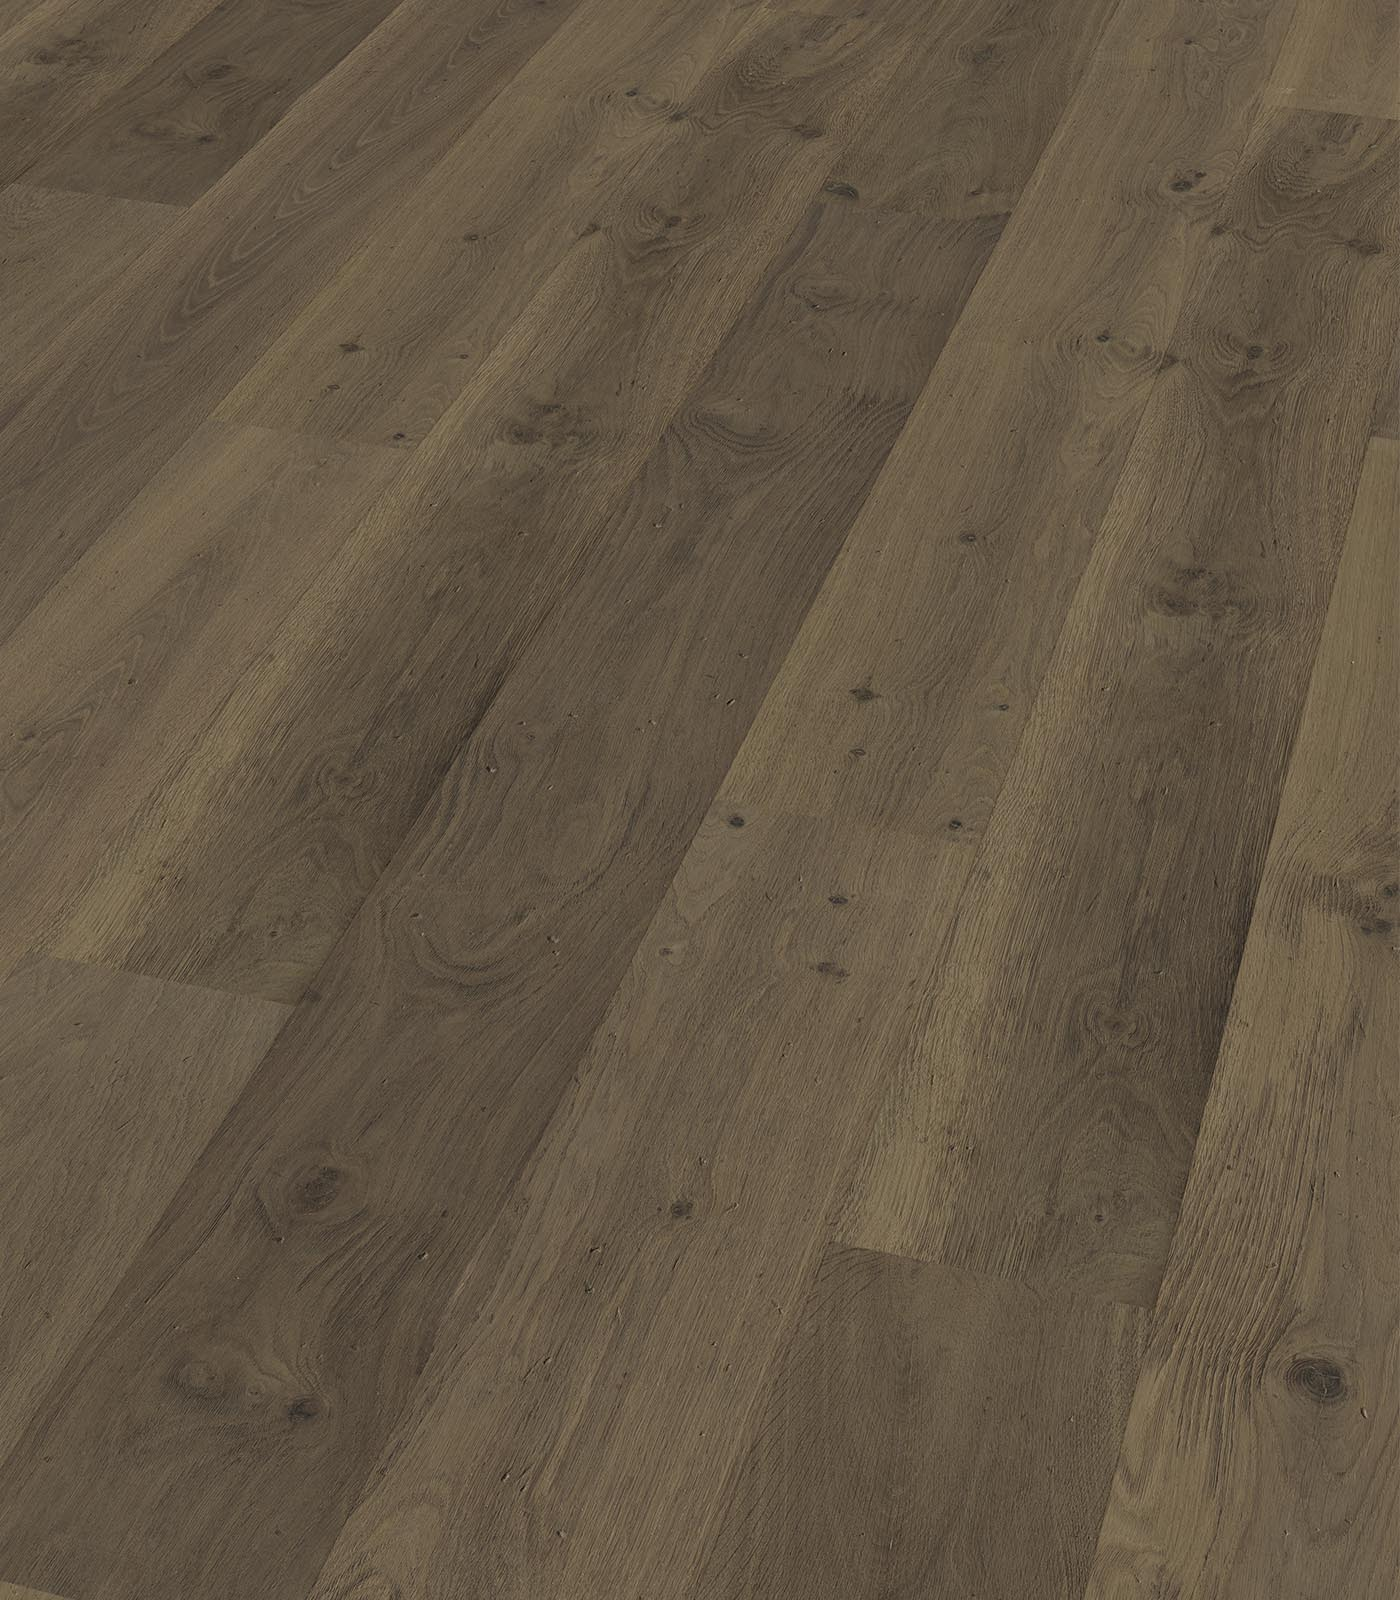 Verona-European Oak flooring-Heritage Collection-angle